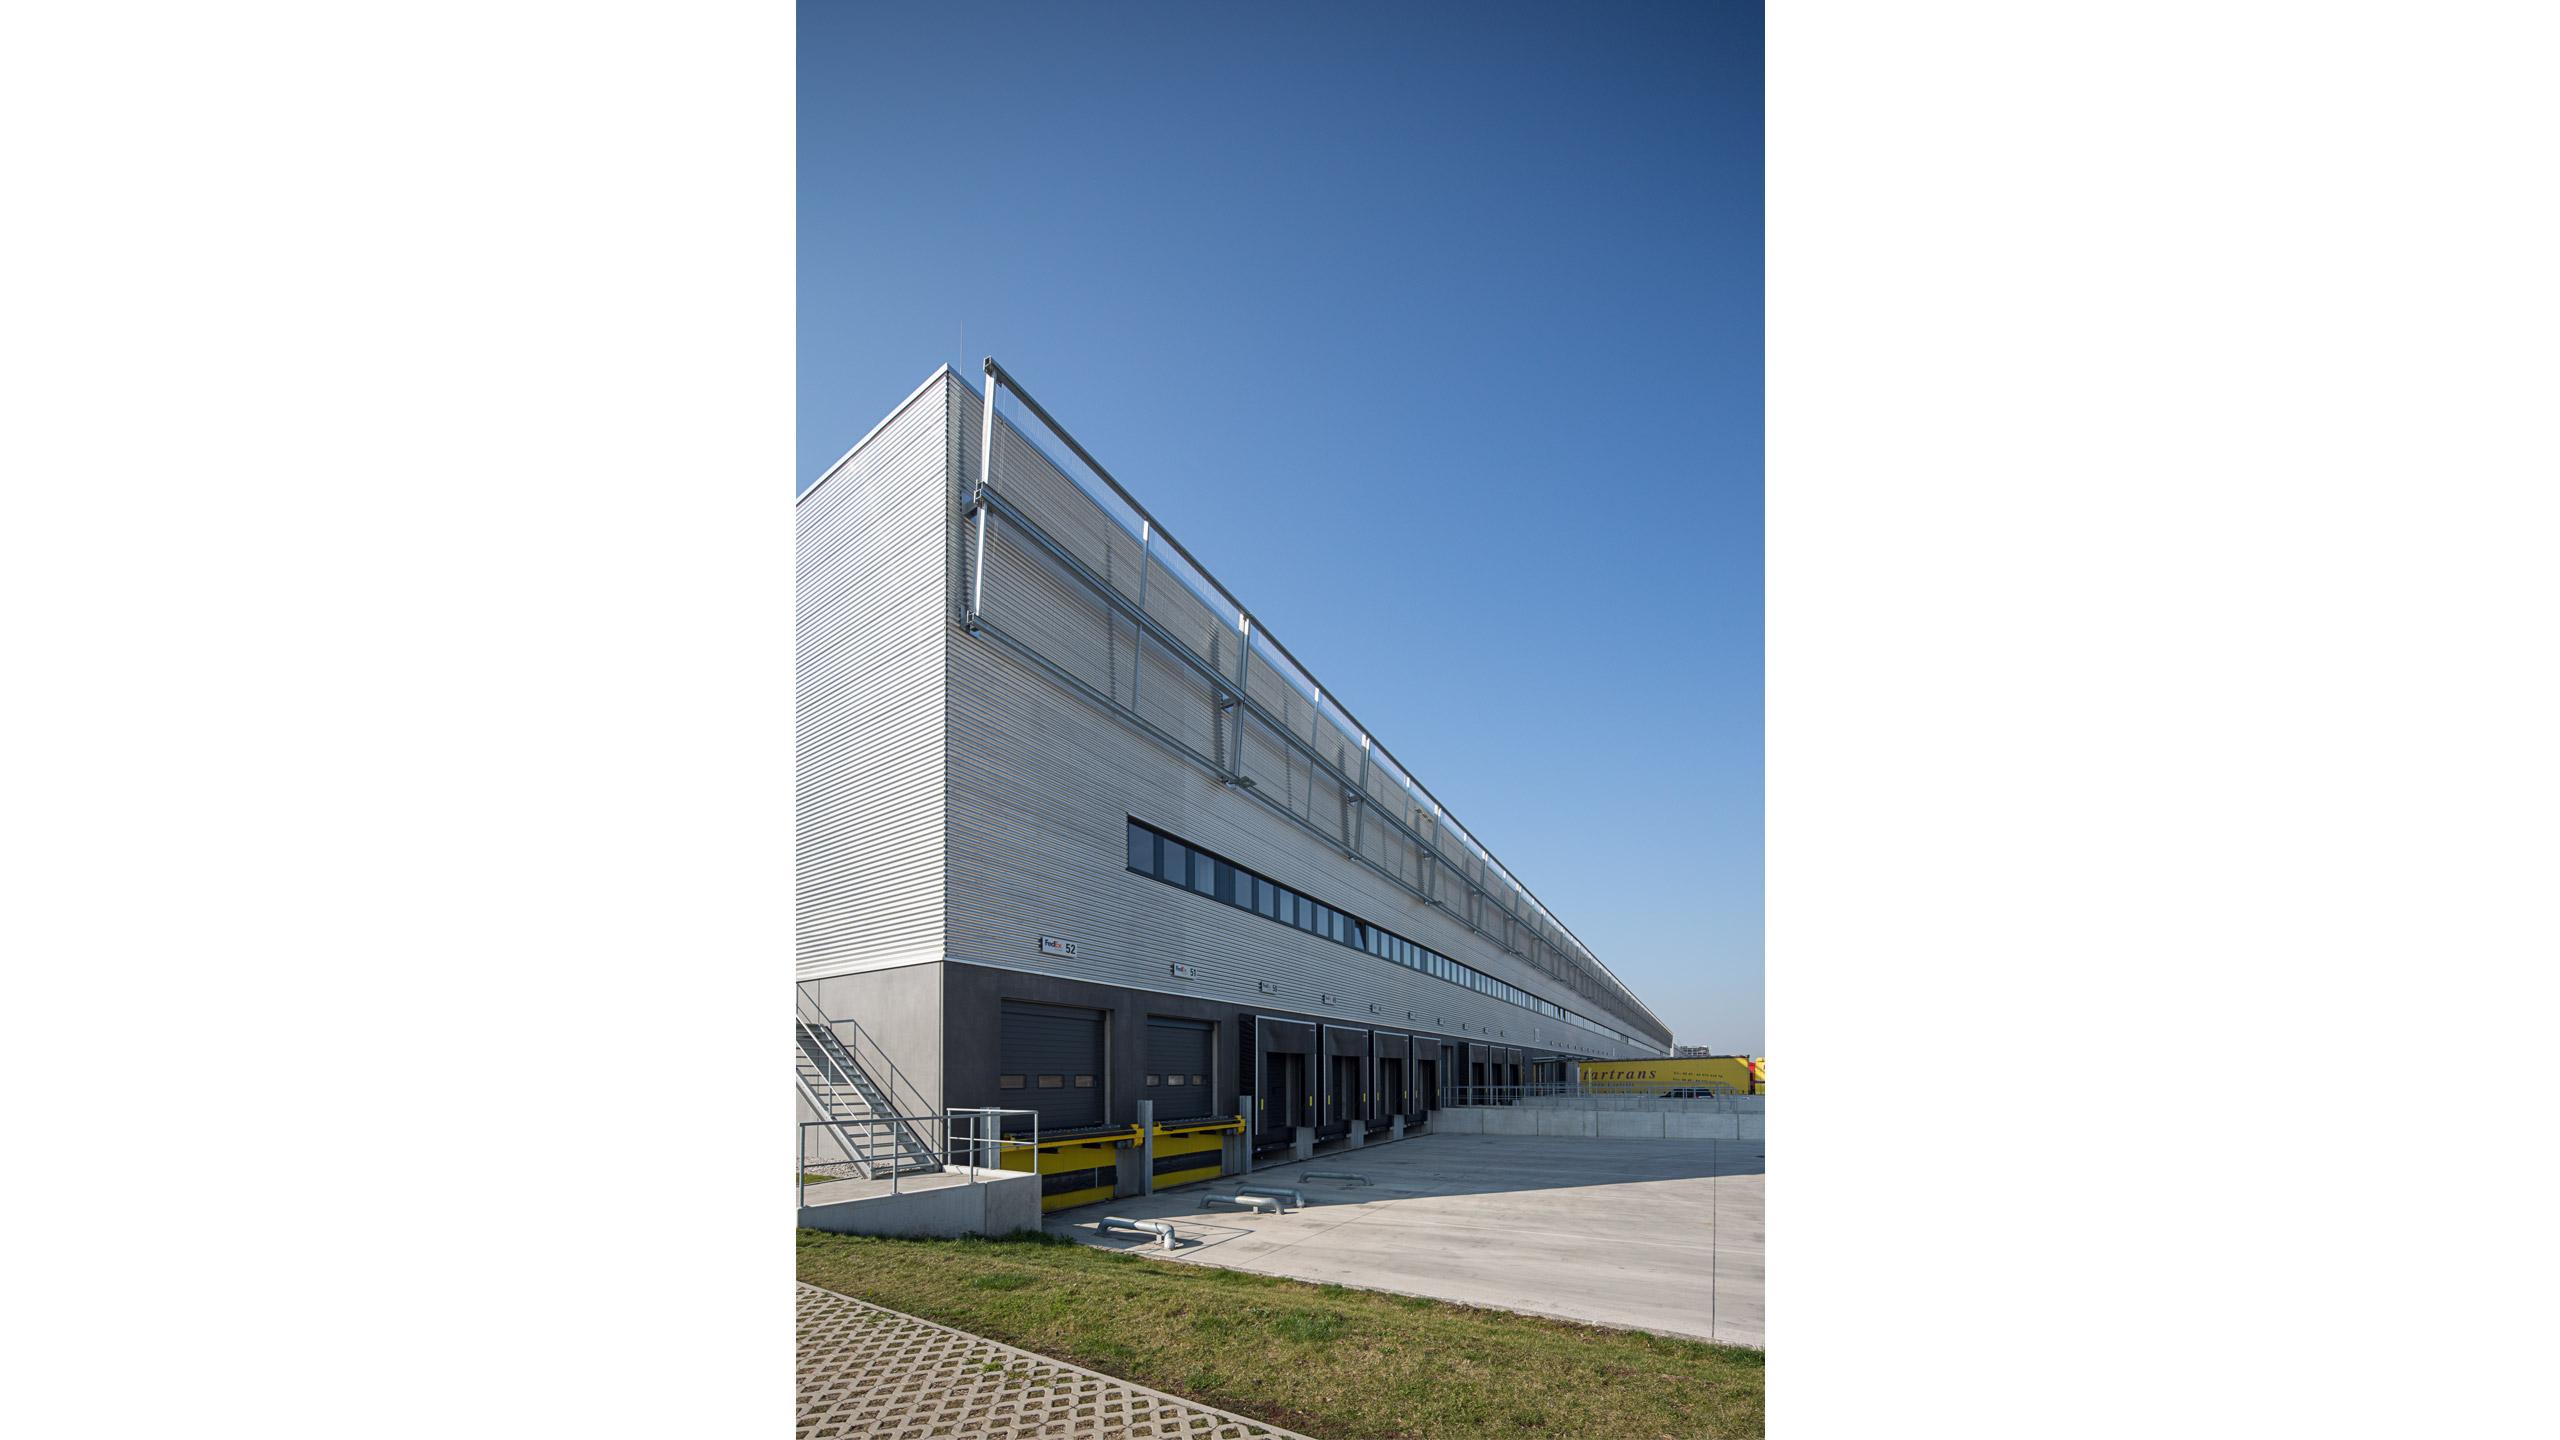 Logistik Architektur München